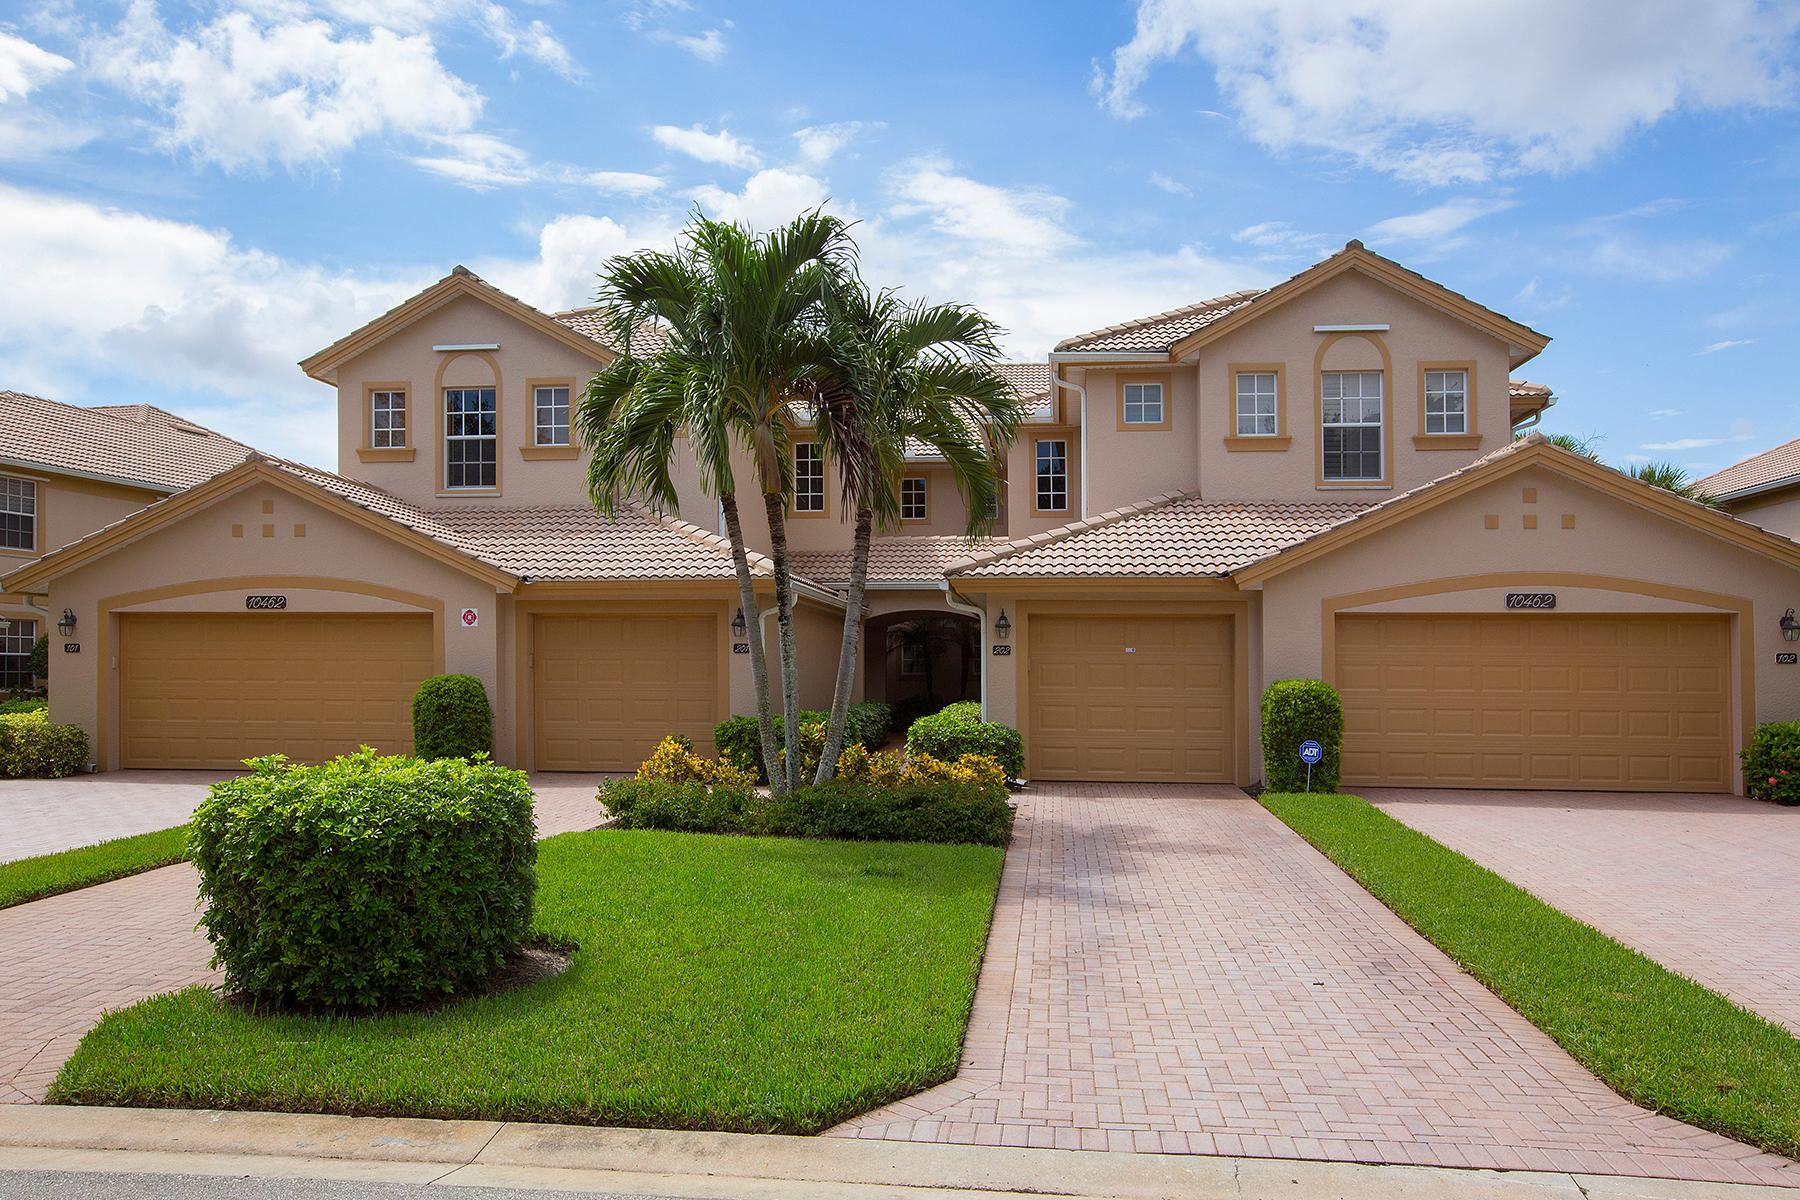 Condominium for Sale at OAK HAMMOCK 10462 Autumn Breeze Dr 202 Estero, Florida, 34135 United States